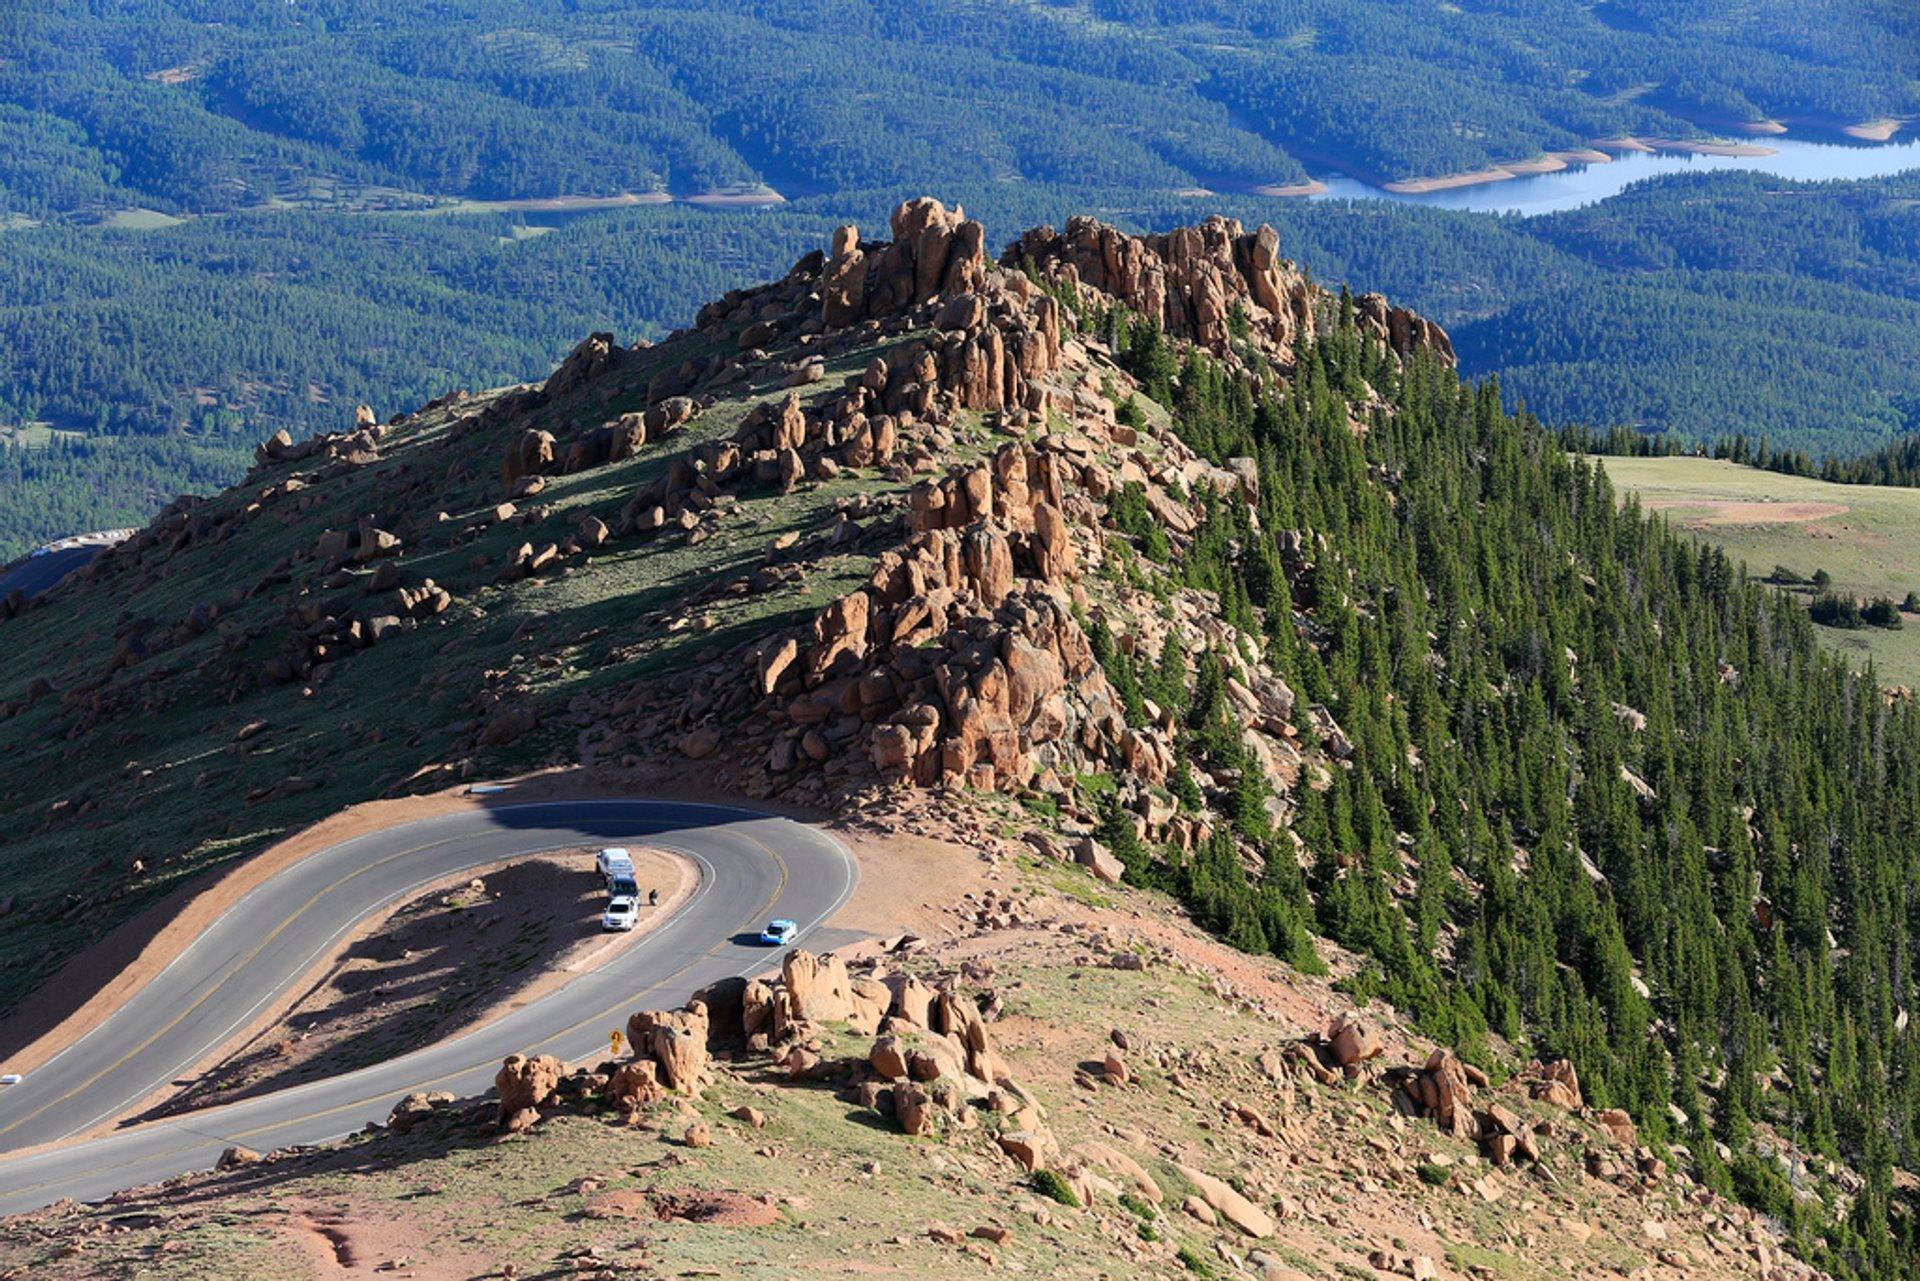 Pikes Peak International Hill Climb in Colorado - Best Season 2020